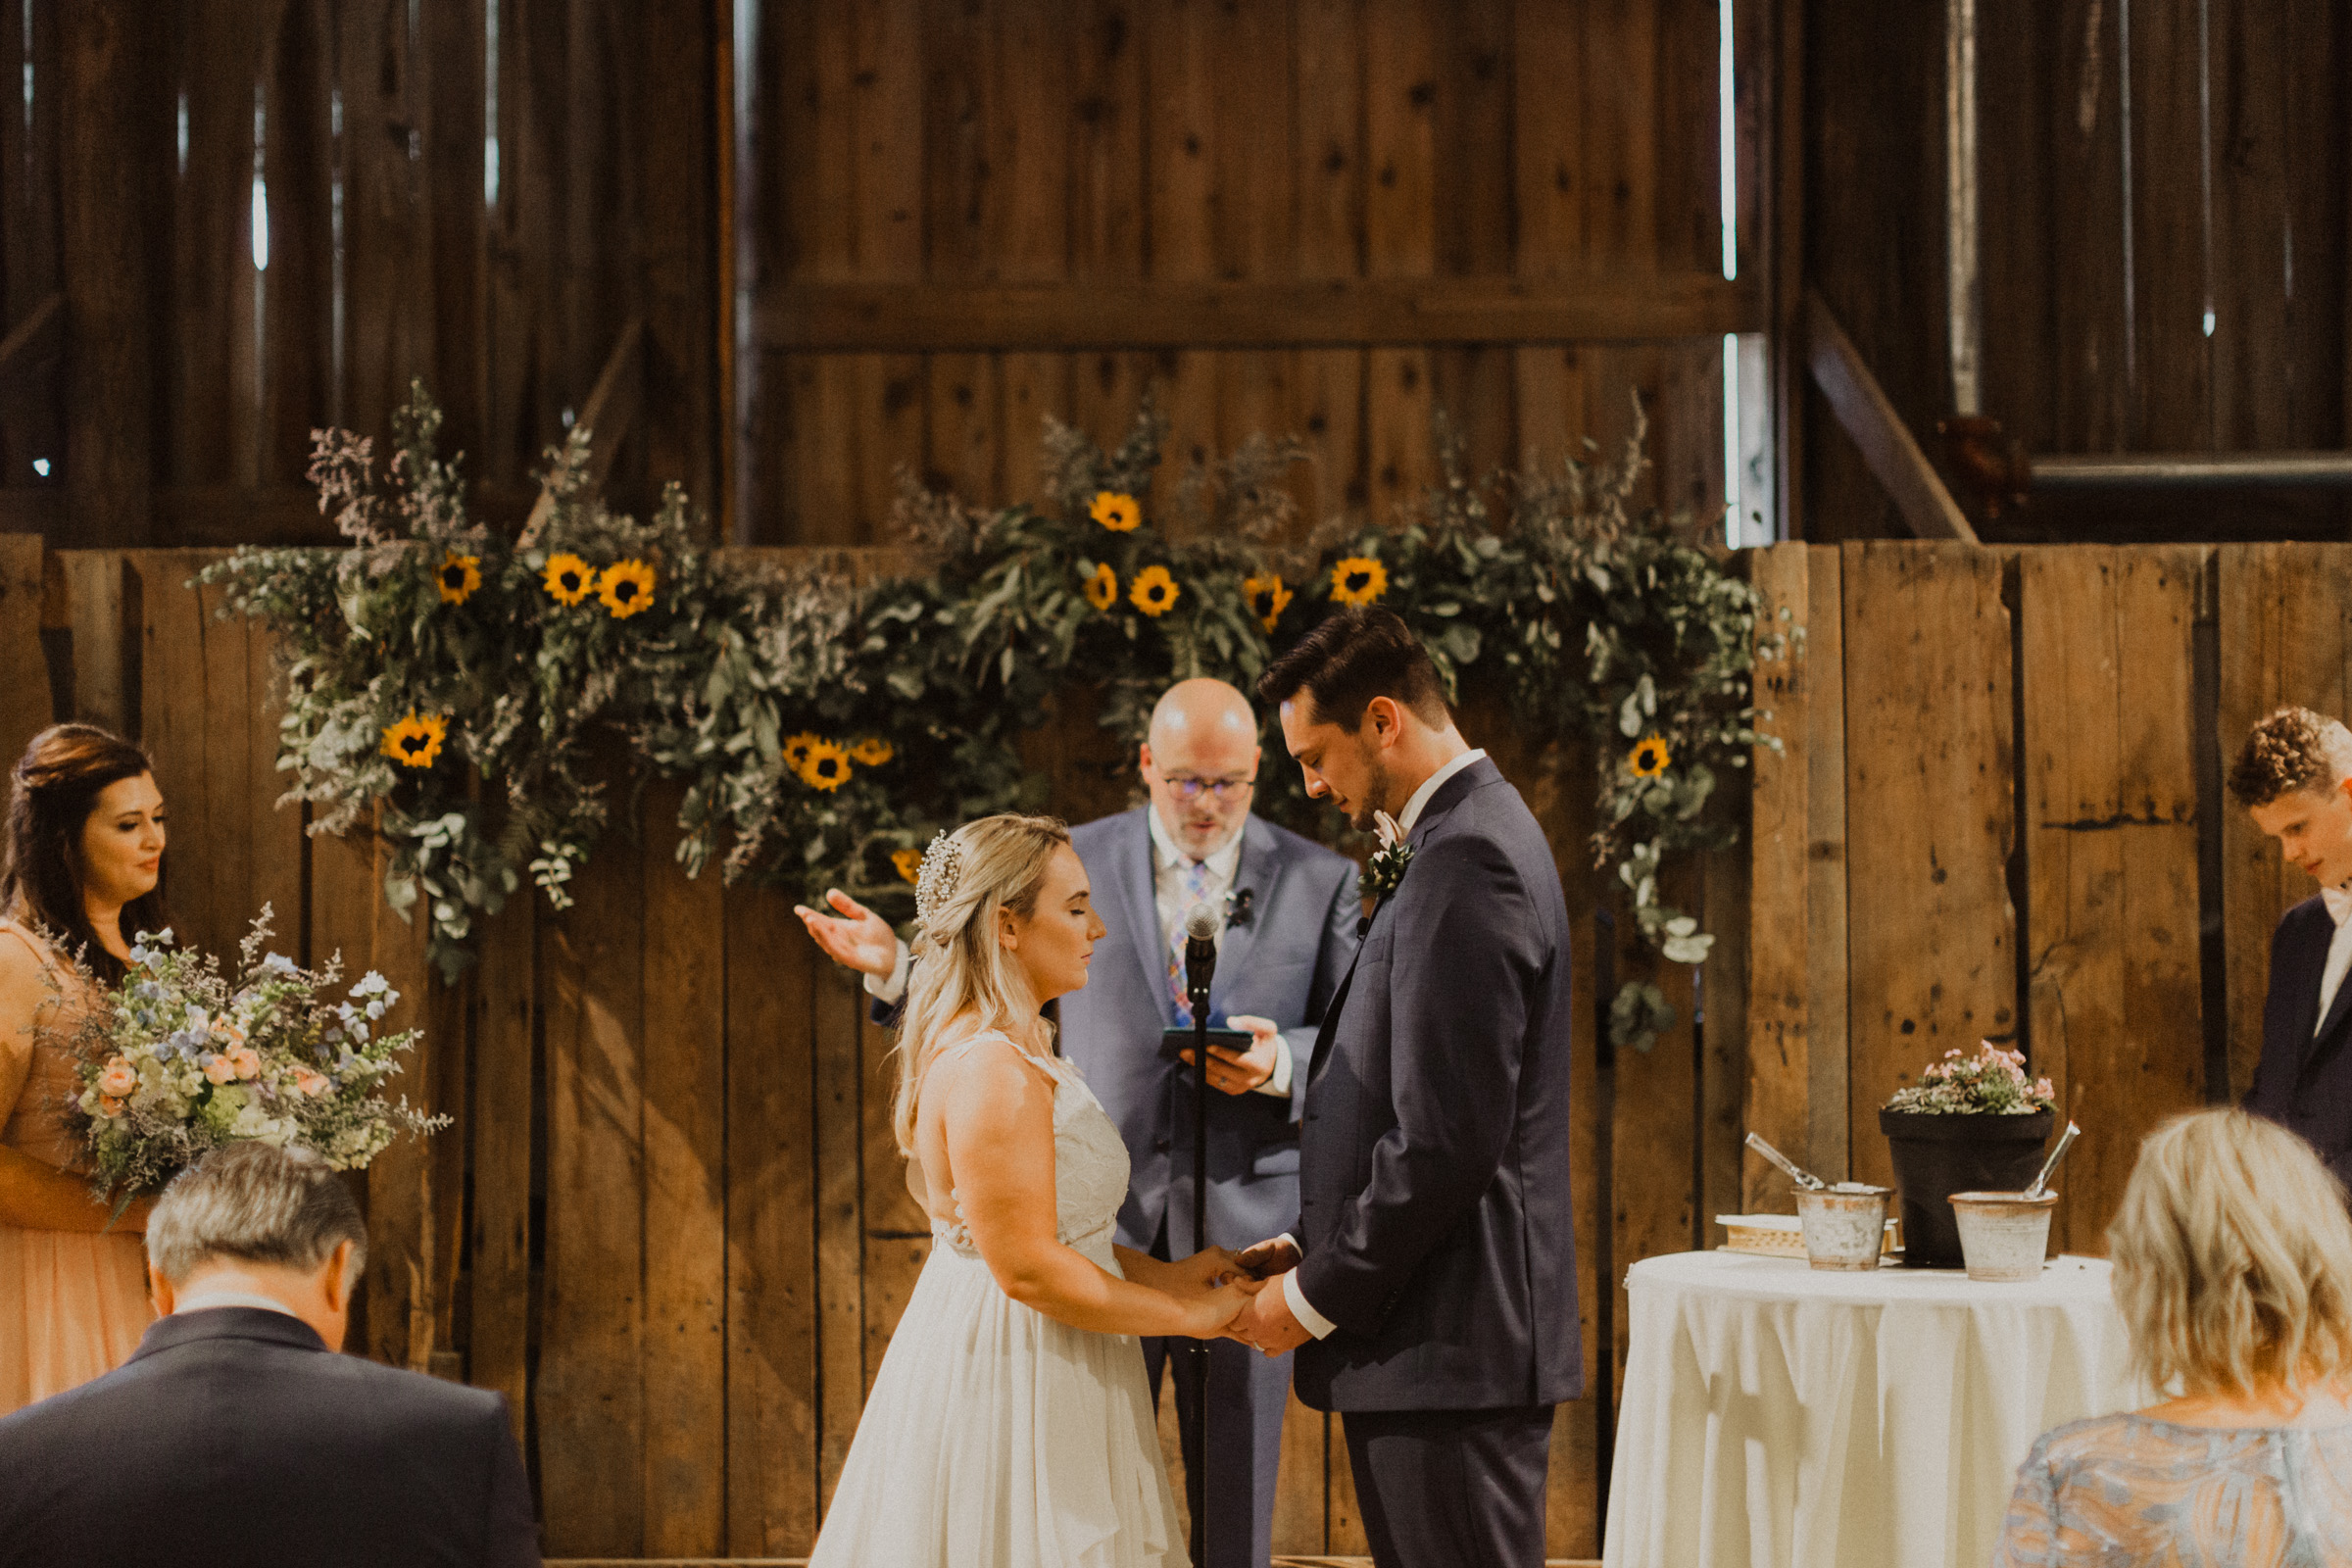 alyssa barletter photography nelson wedding nebraska city lied lodge morton barn spring wedding photographer-40.jpg